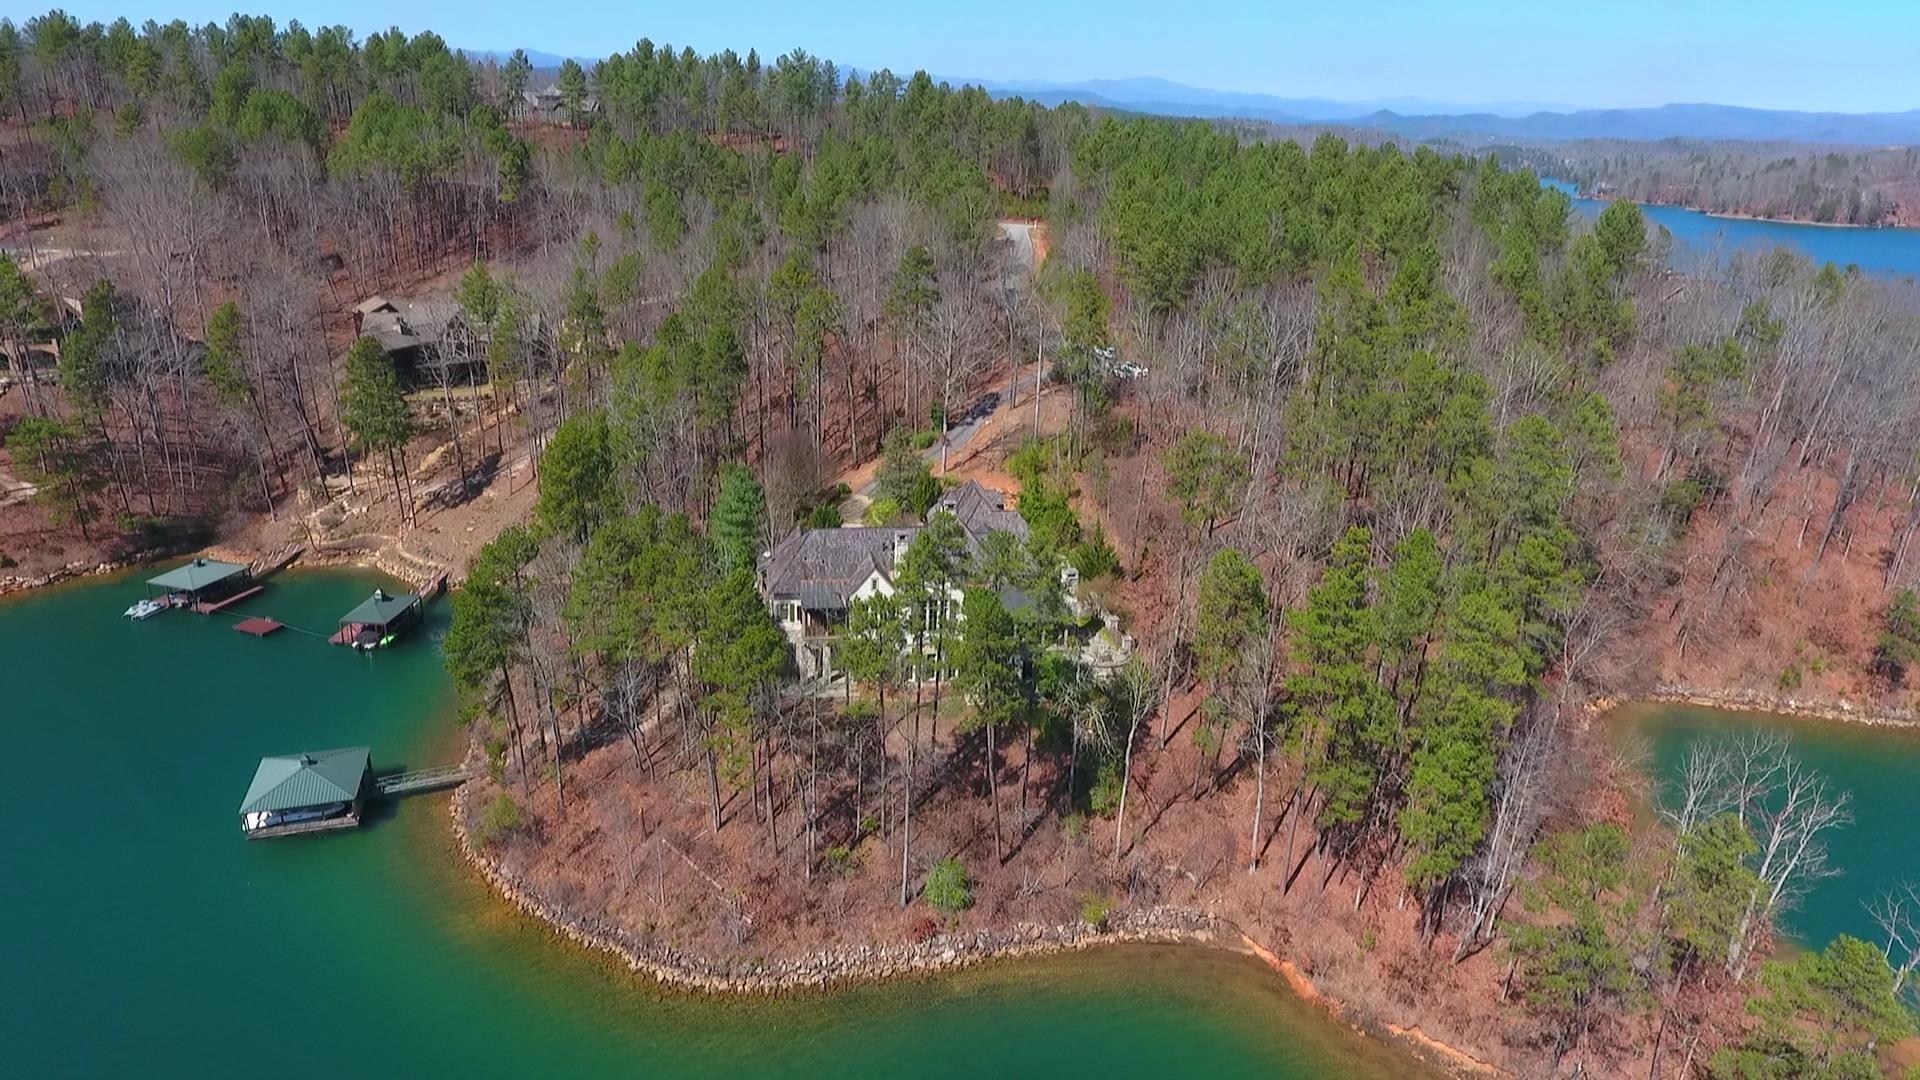 Villa per Vendita alle ore A True Waterfront Classic 404 Moonlit Trail The Cliffs At Keowee Falls, Salem, Carolina Del Sud, 29676 Stati Uniti